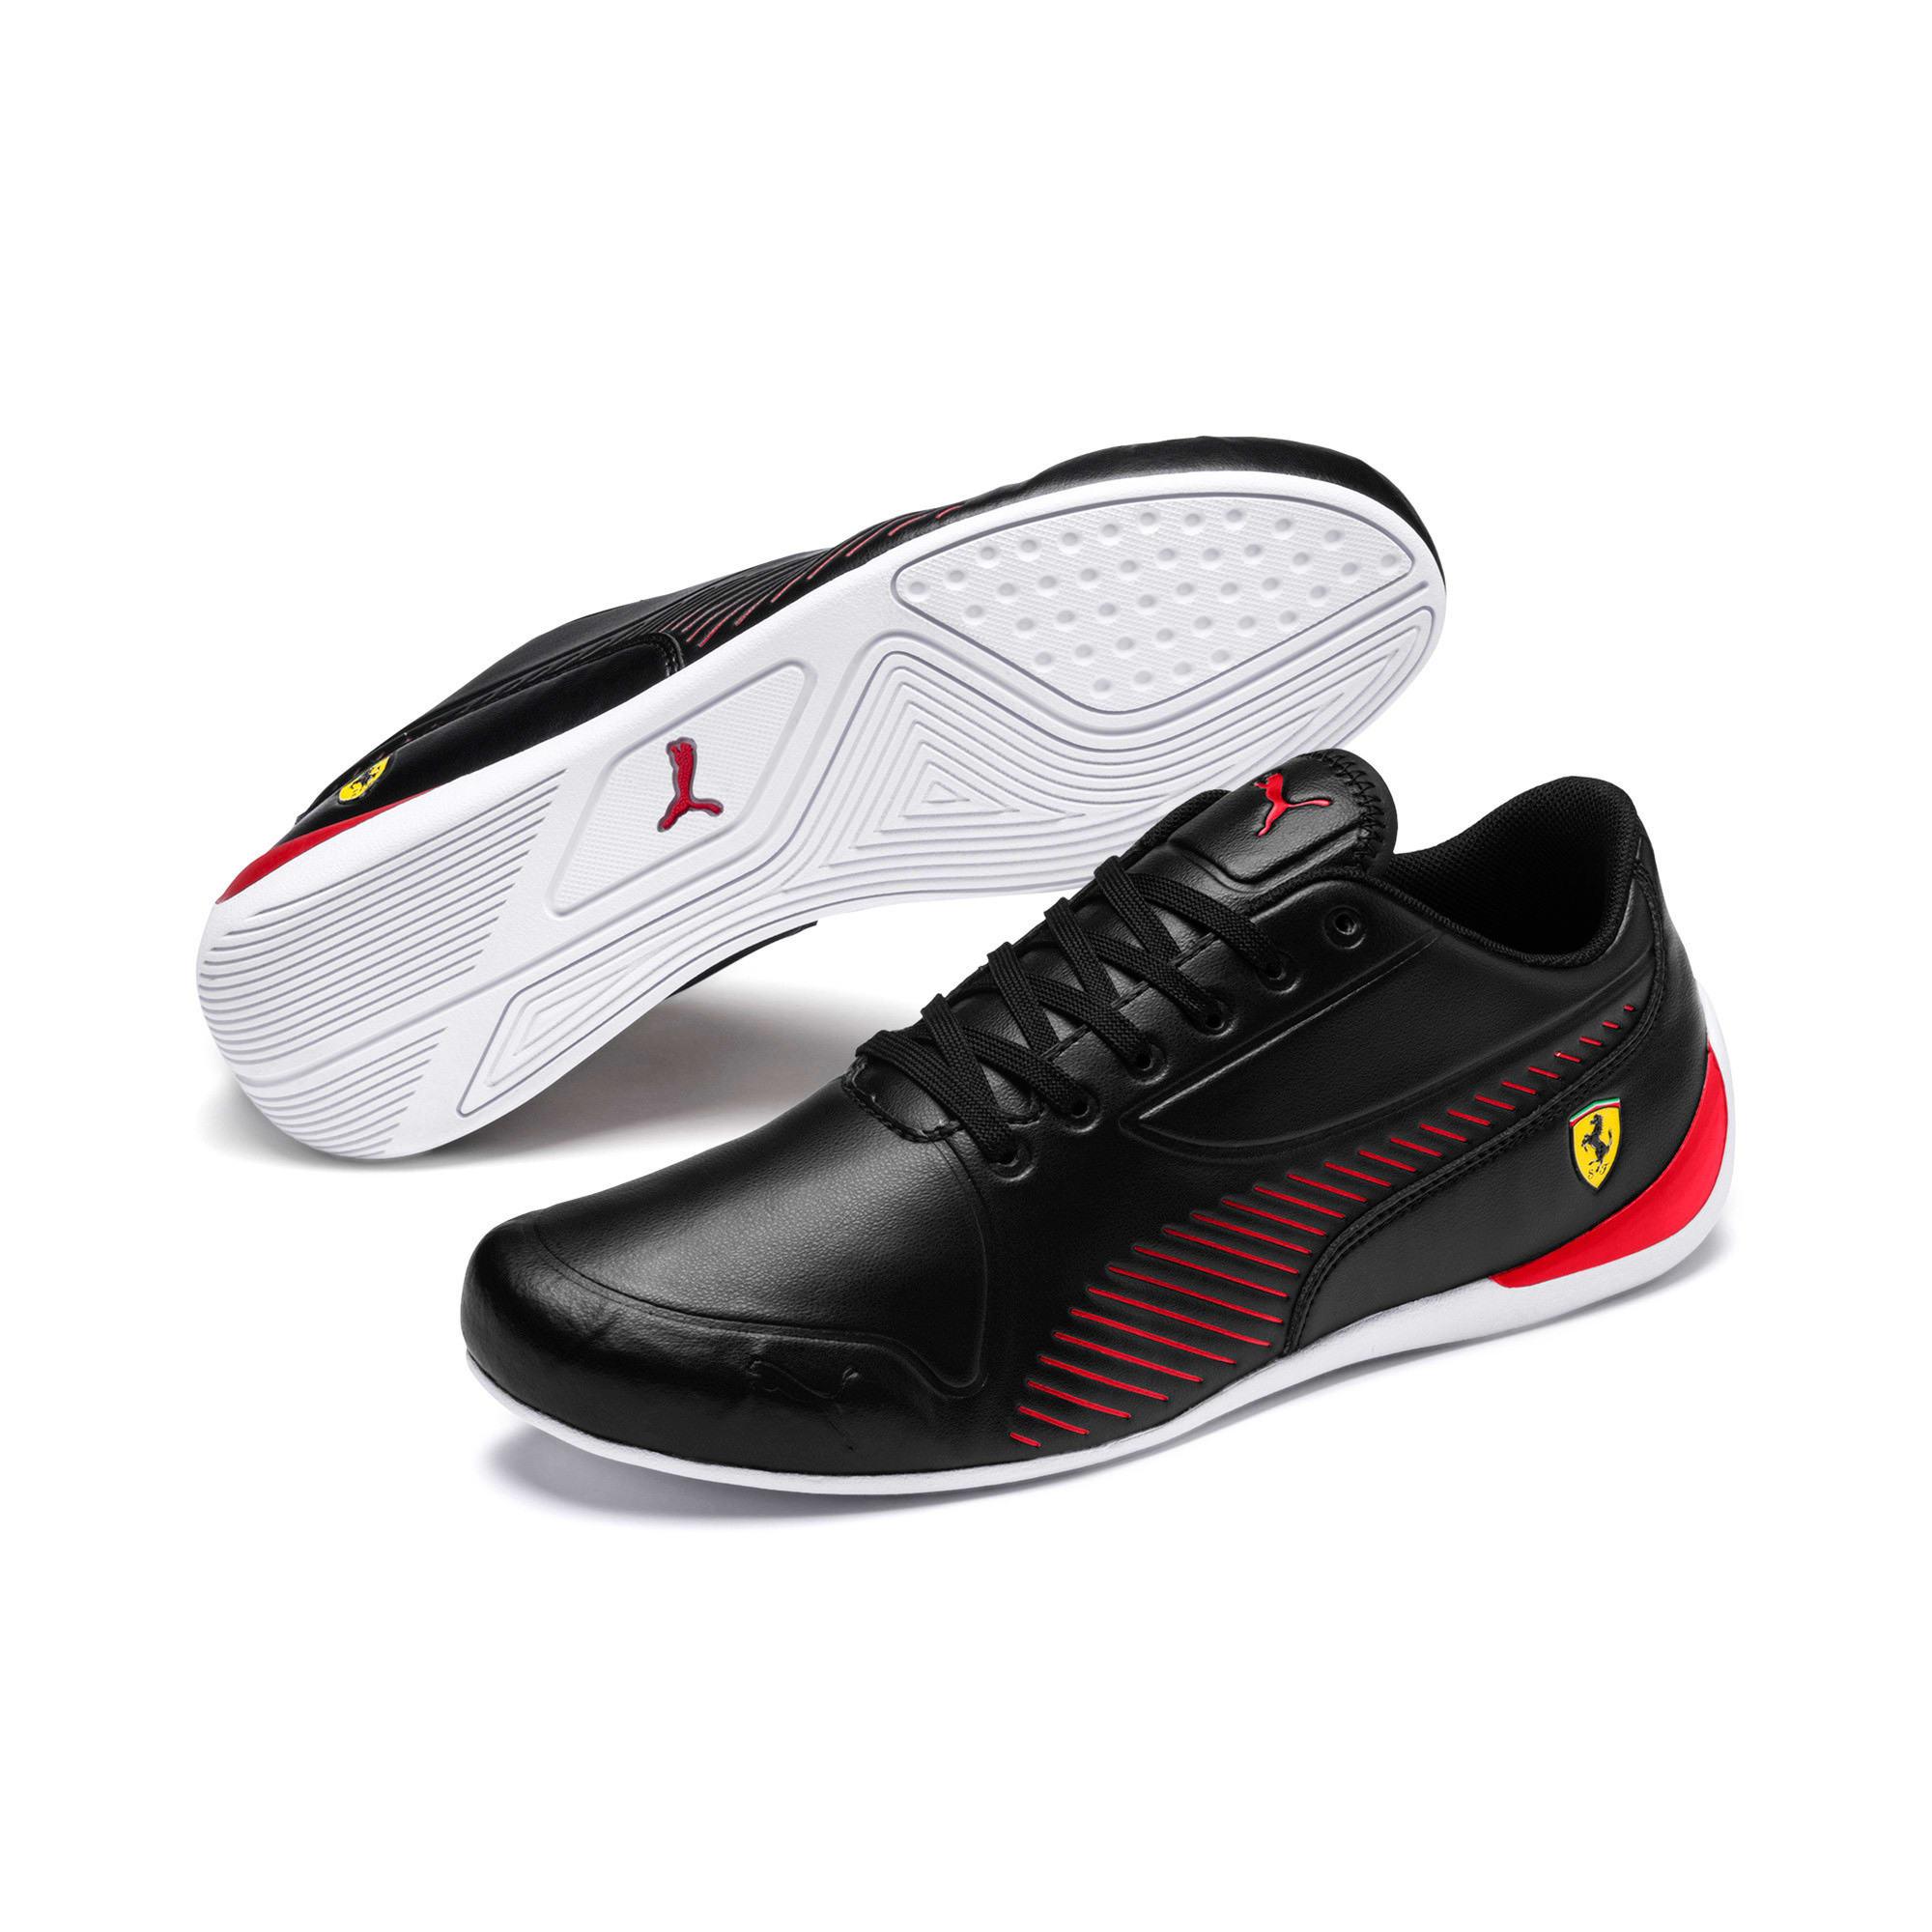 Thumbnail 2 of Scuderia Ferrari Drift Cat 7S Ultra Men's Shoes, Puma Black-Rosso Corsa, medium